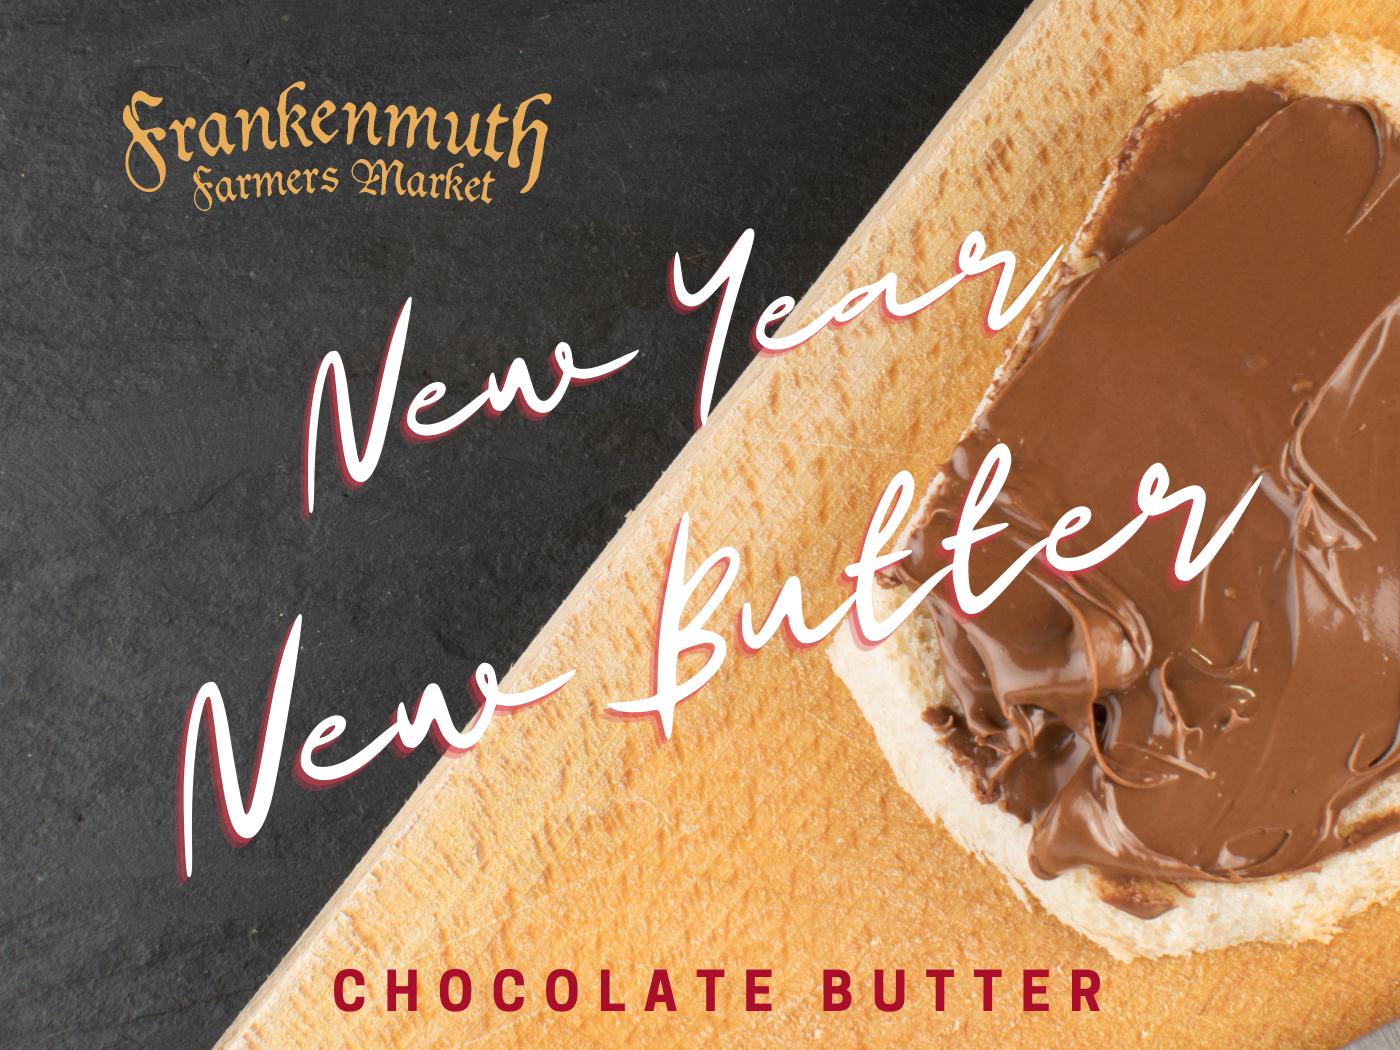 Market Made Chocolate Butter